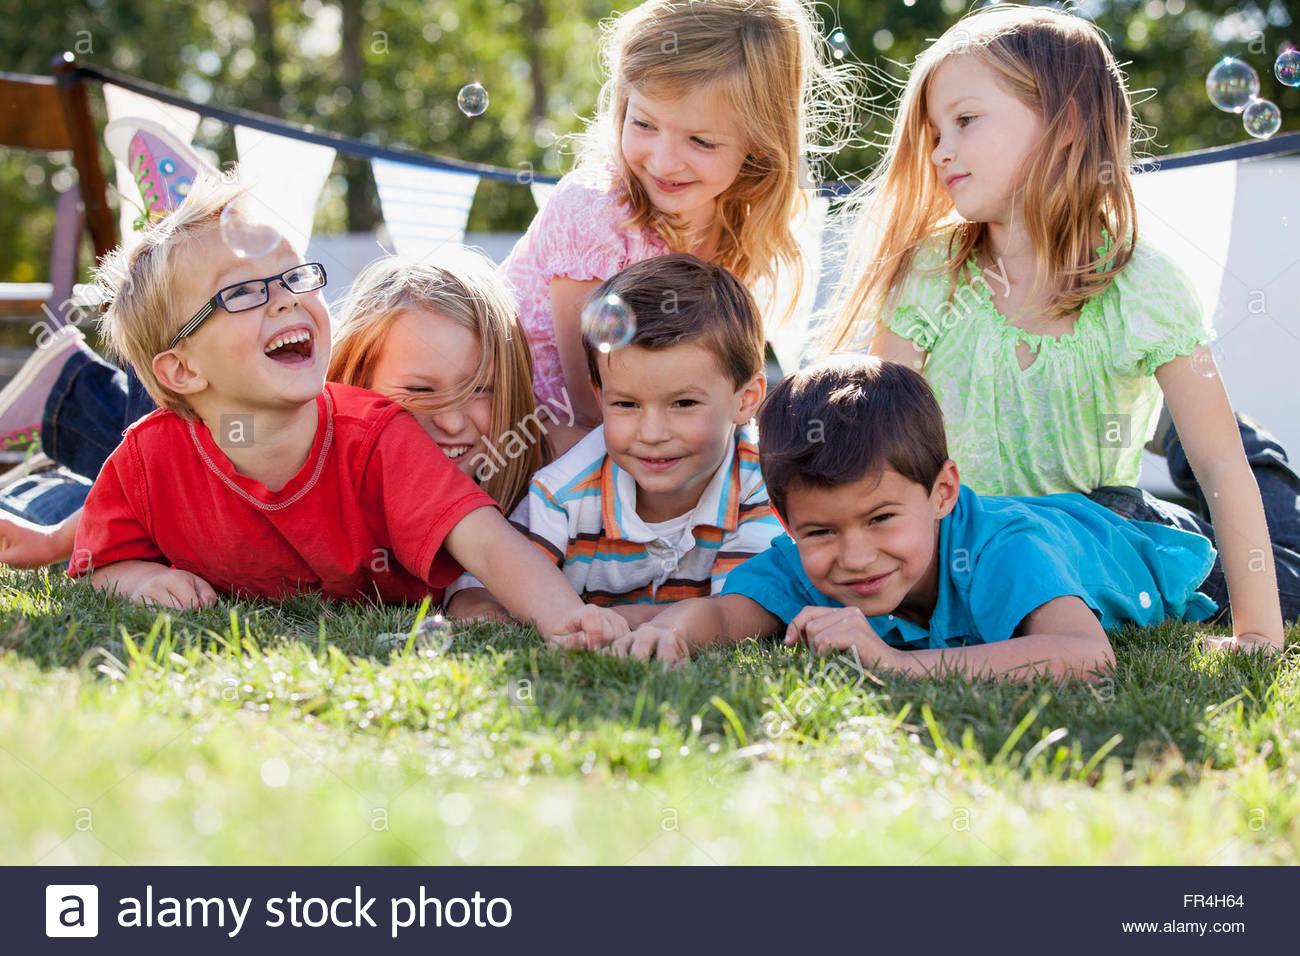 Cousins bulles attraper car ils reposent sur l'herbe. Photo Stock